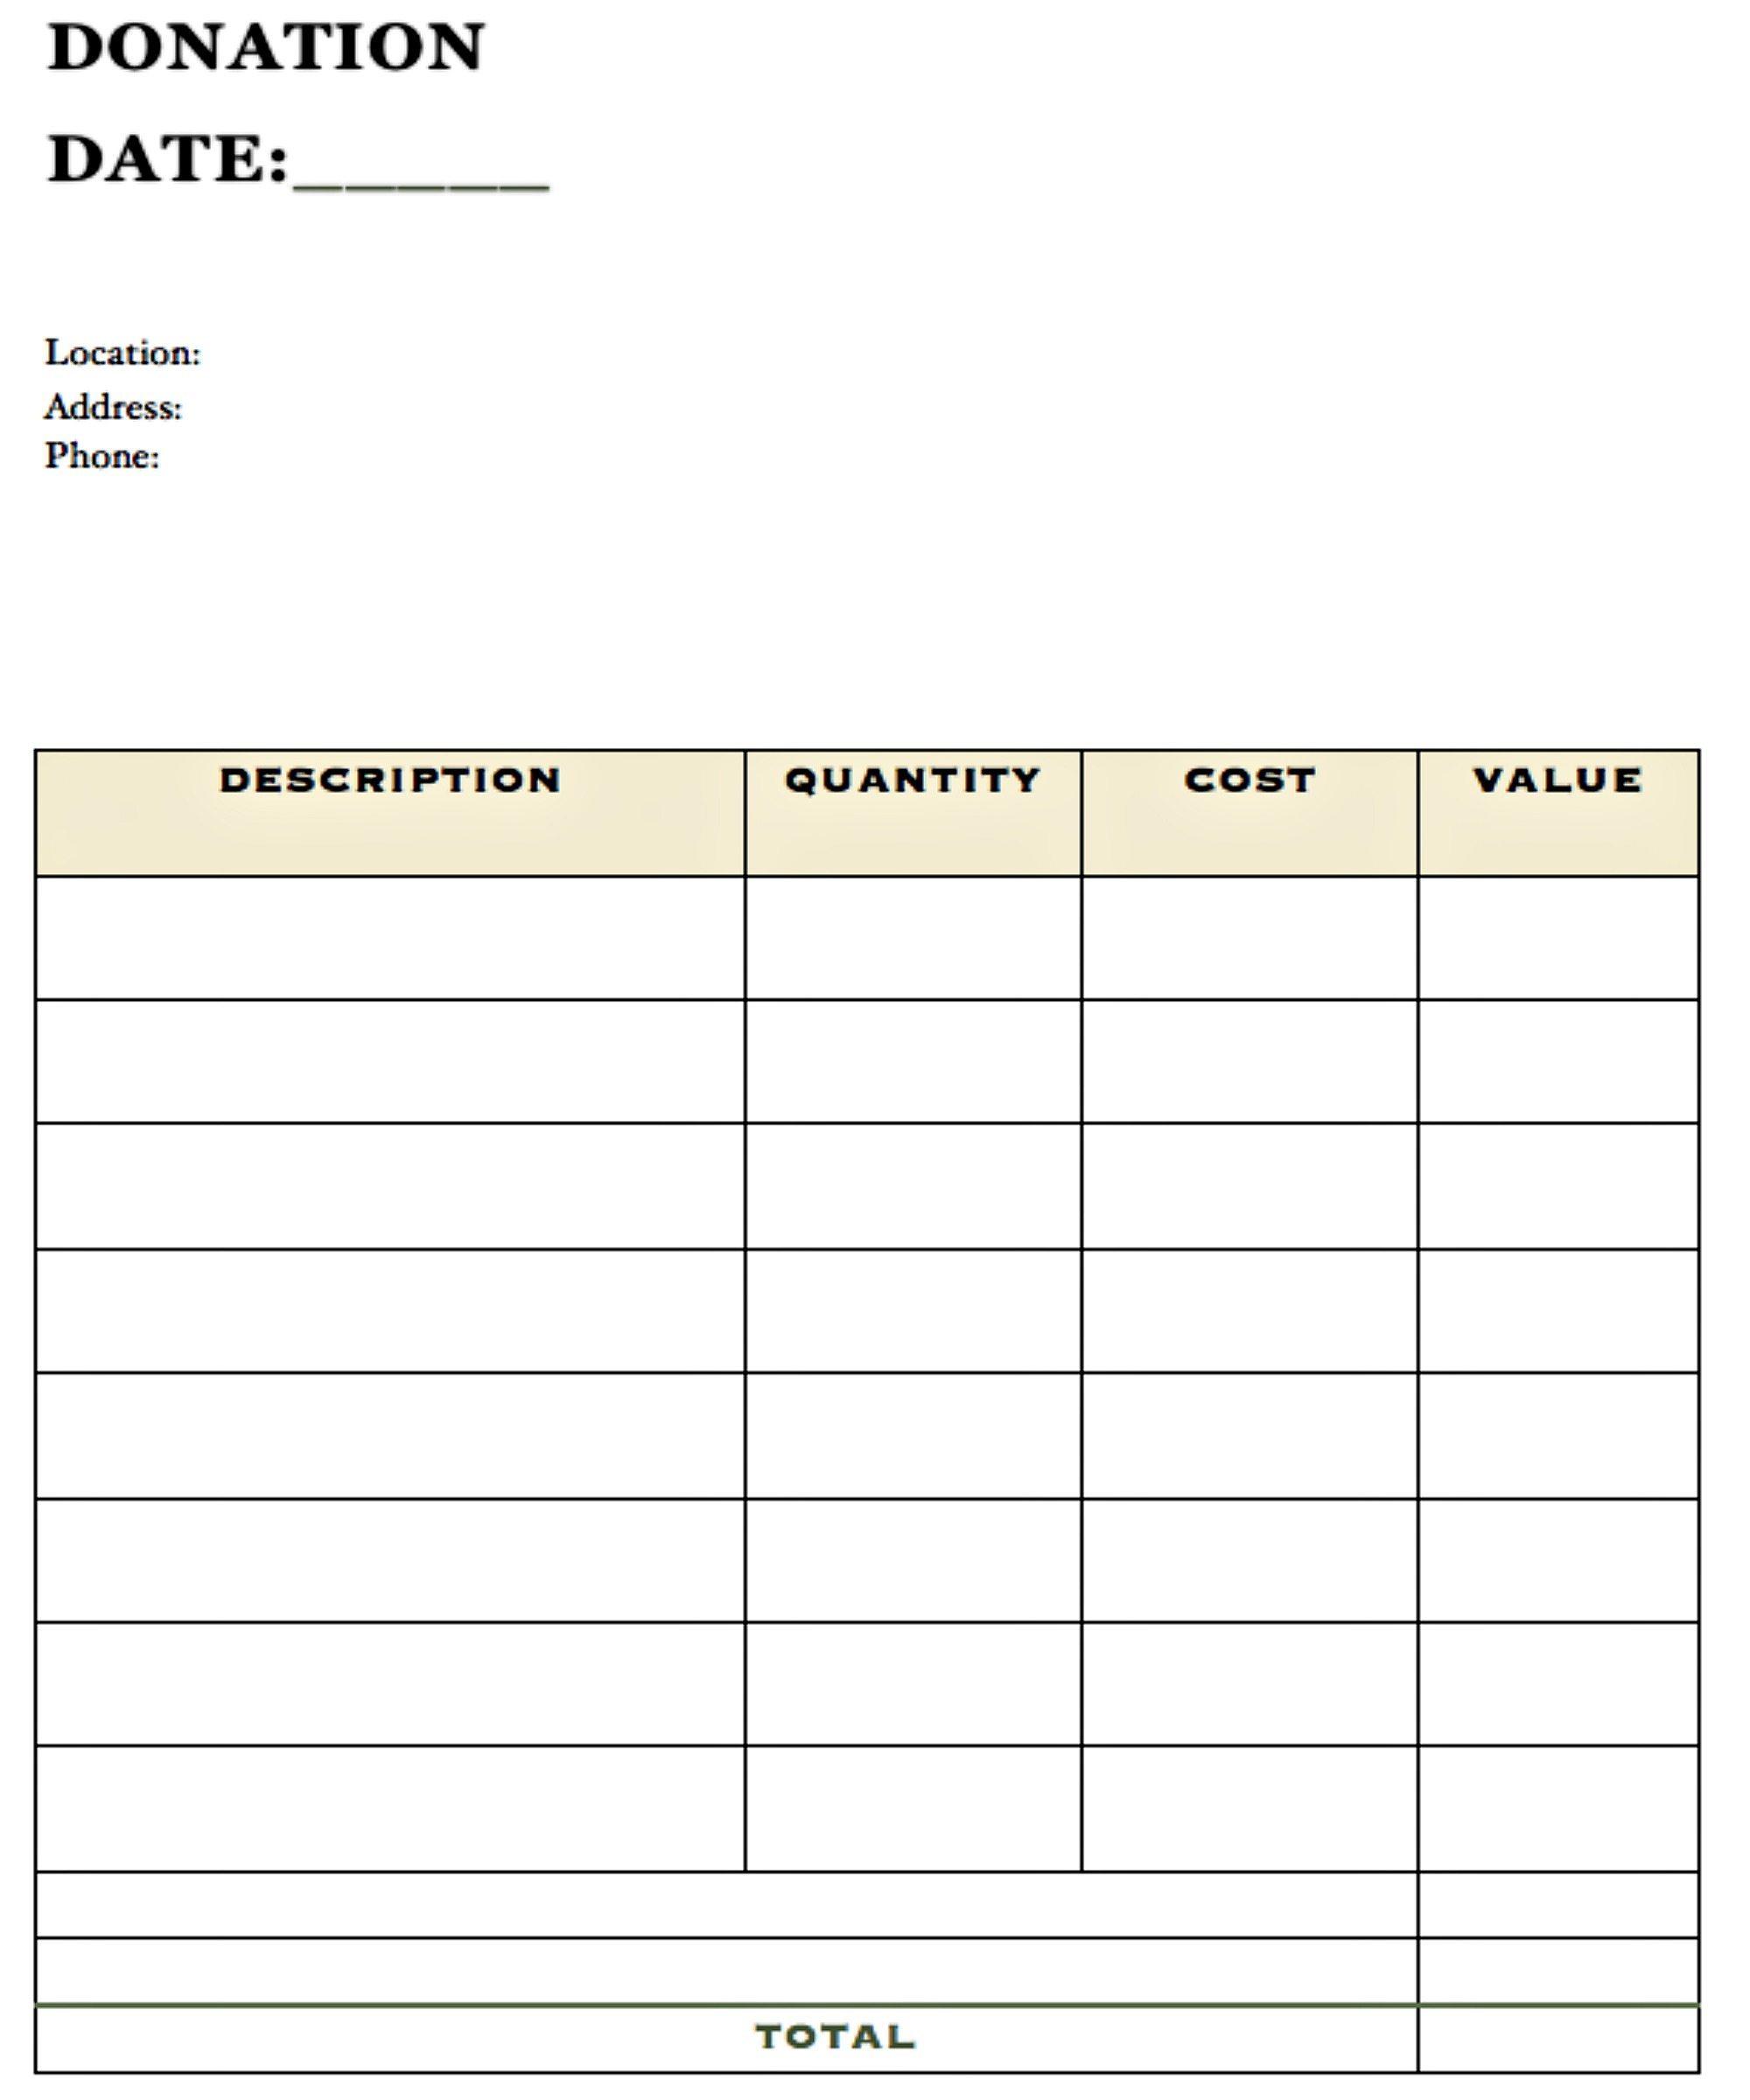 Closet organizing donation form